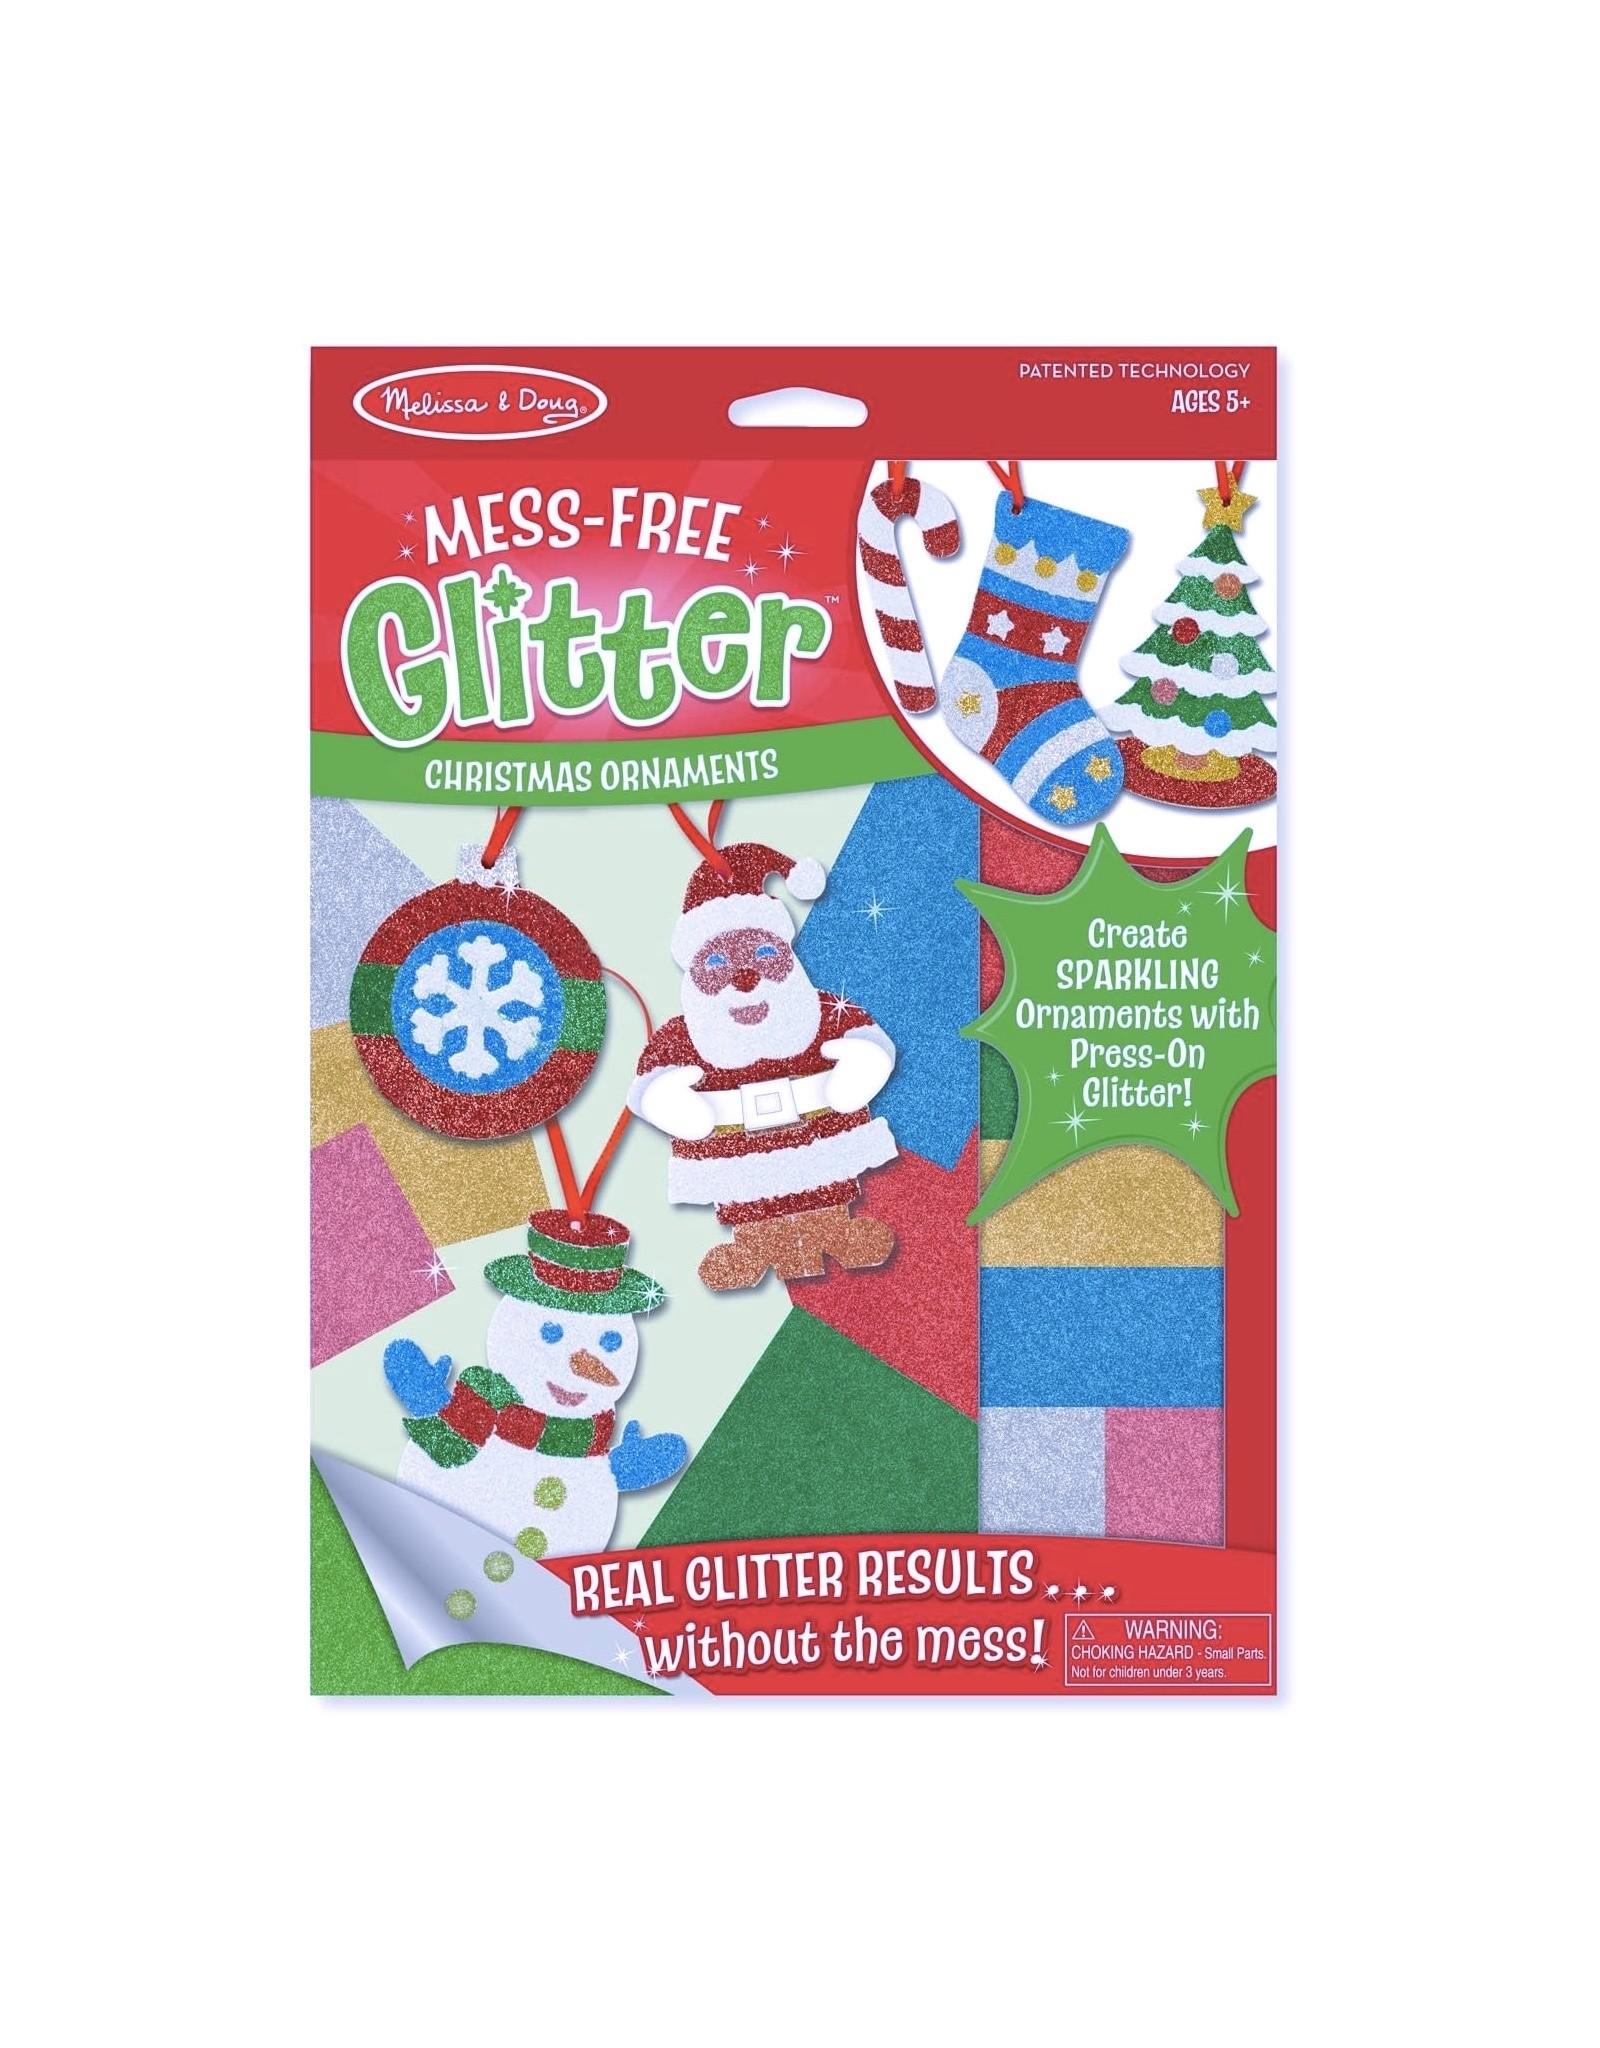 Melissa & Doug Mess-Free Glitter- Christmas Ornament